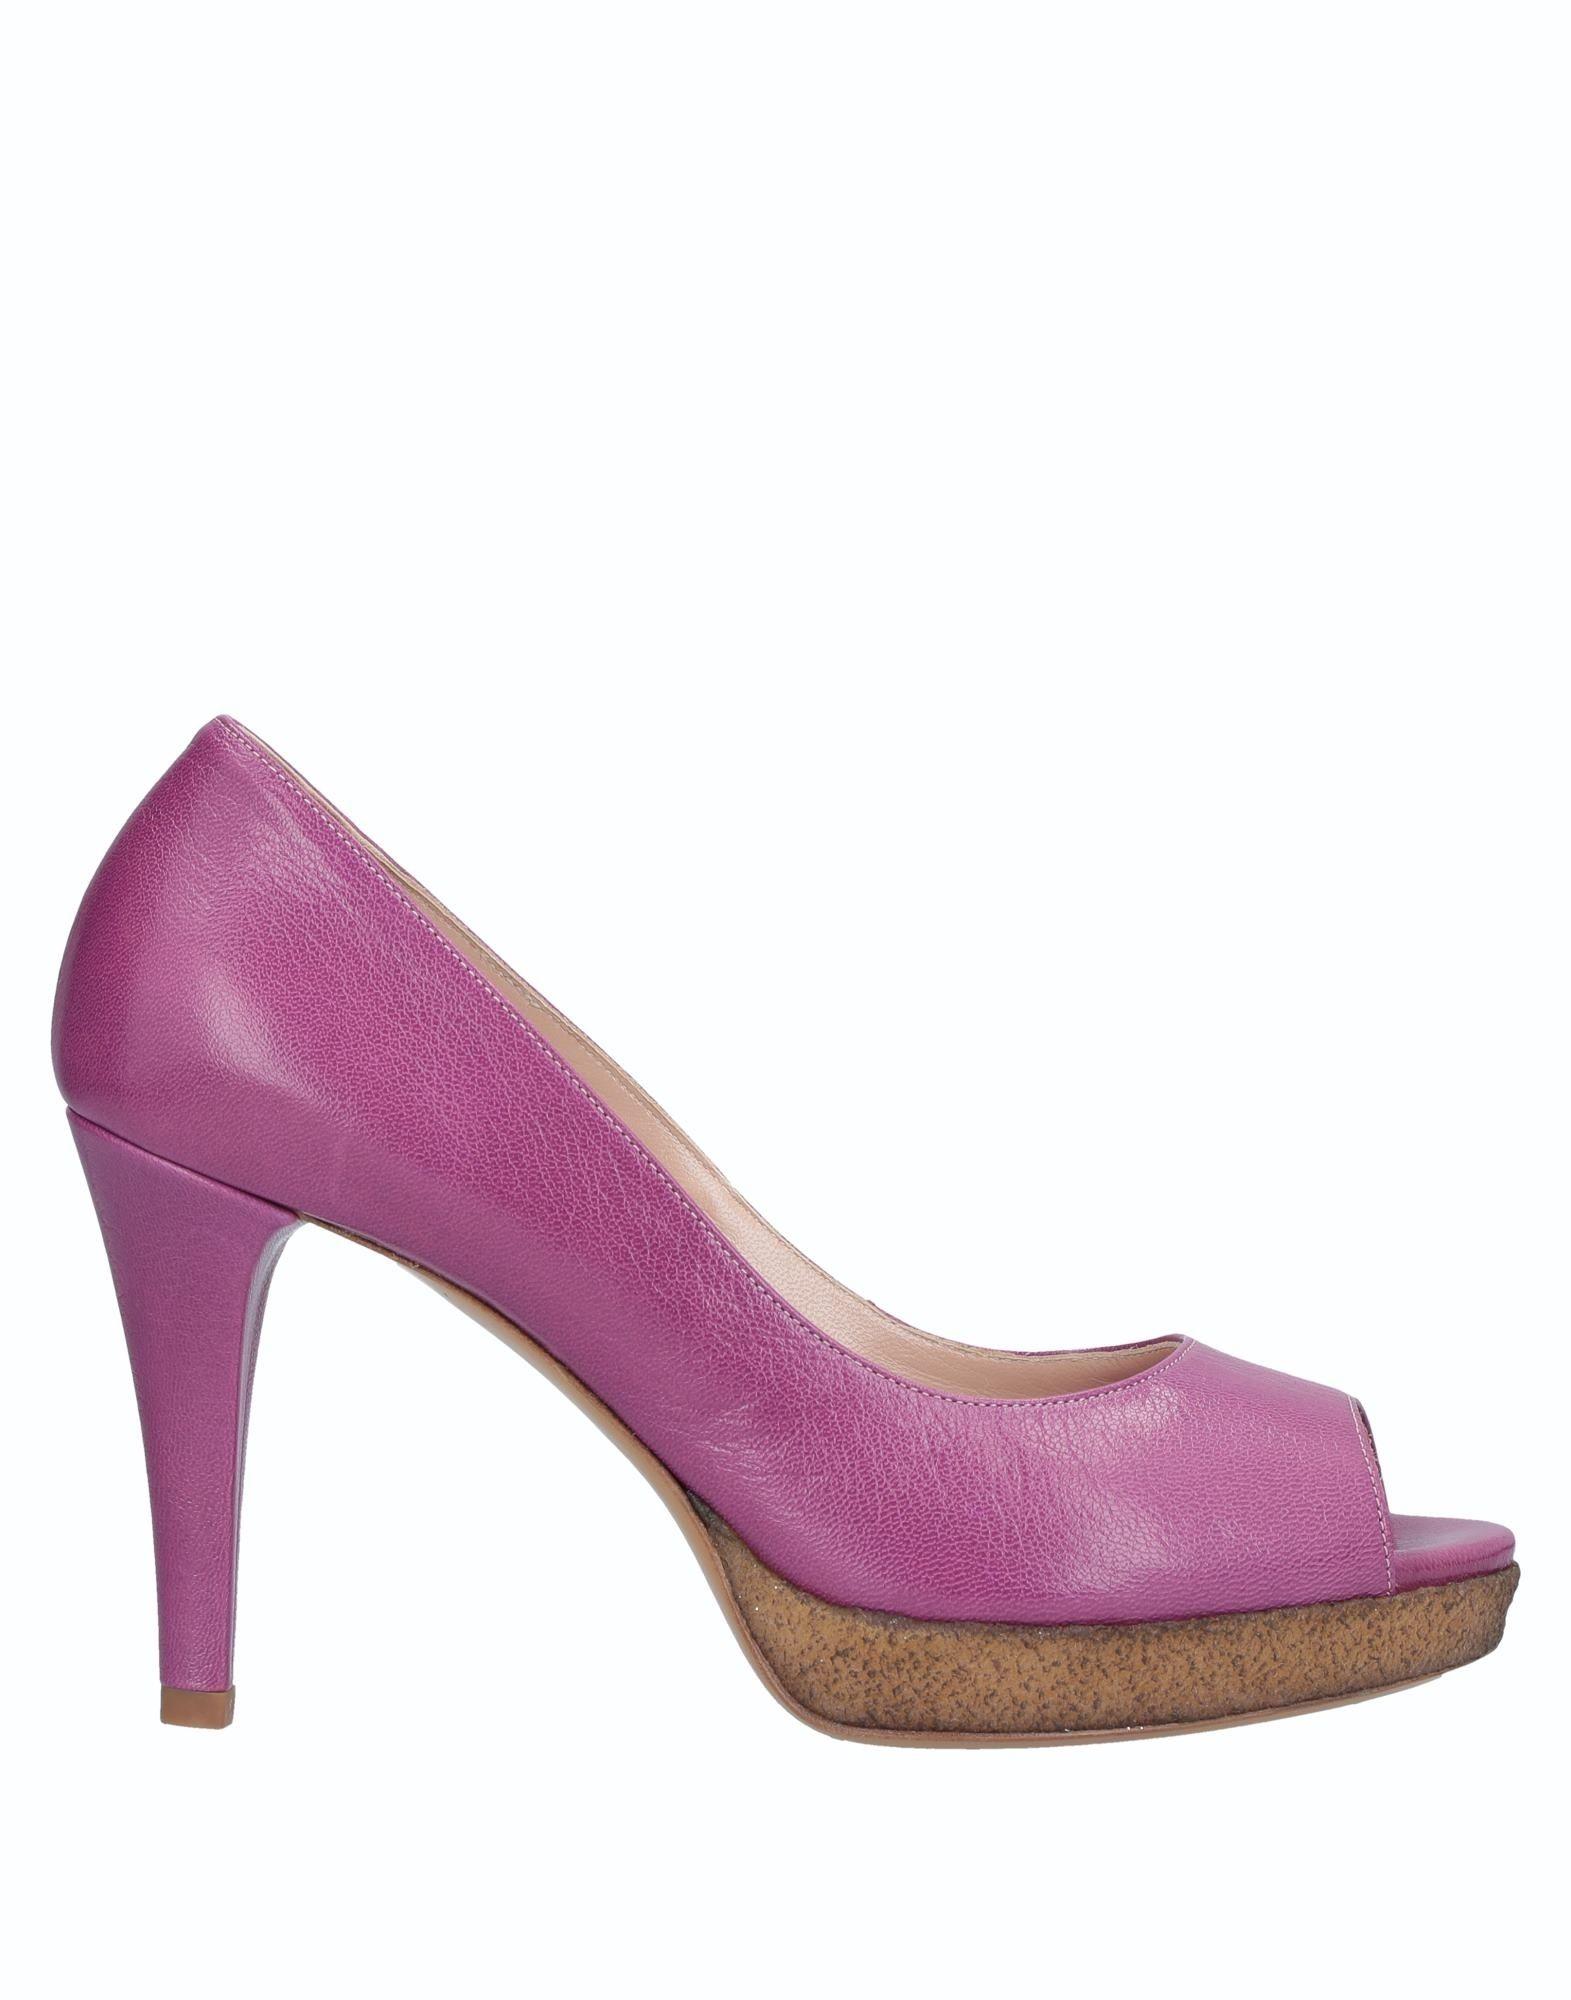 Gut um billige Schuhe Damen zu tragenGuido Sgariglia Pumps Damen Schuhe  11537252OW 6b618b